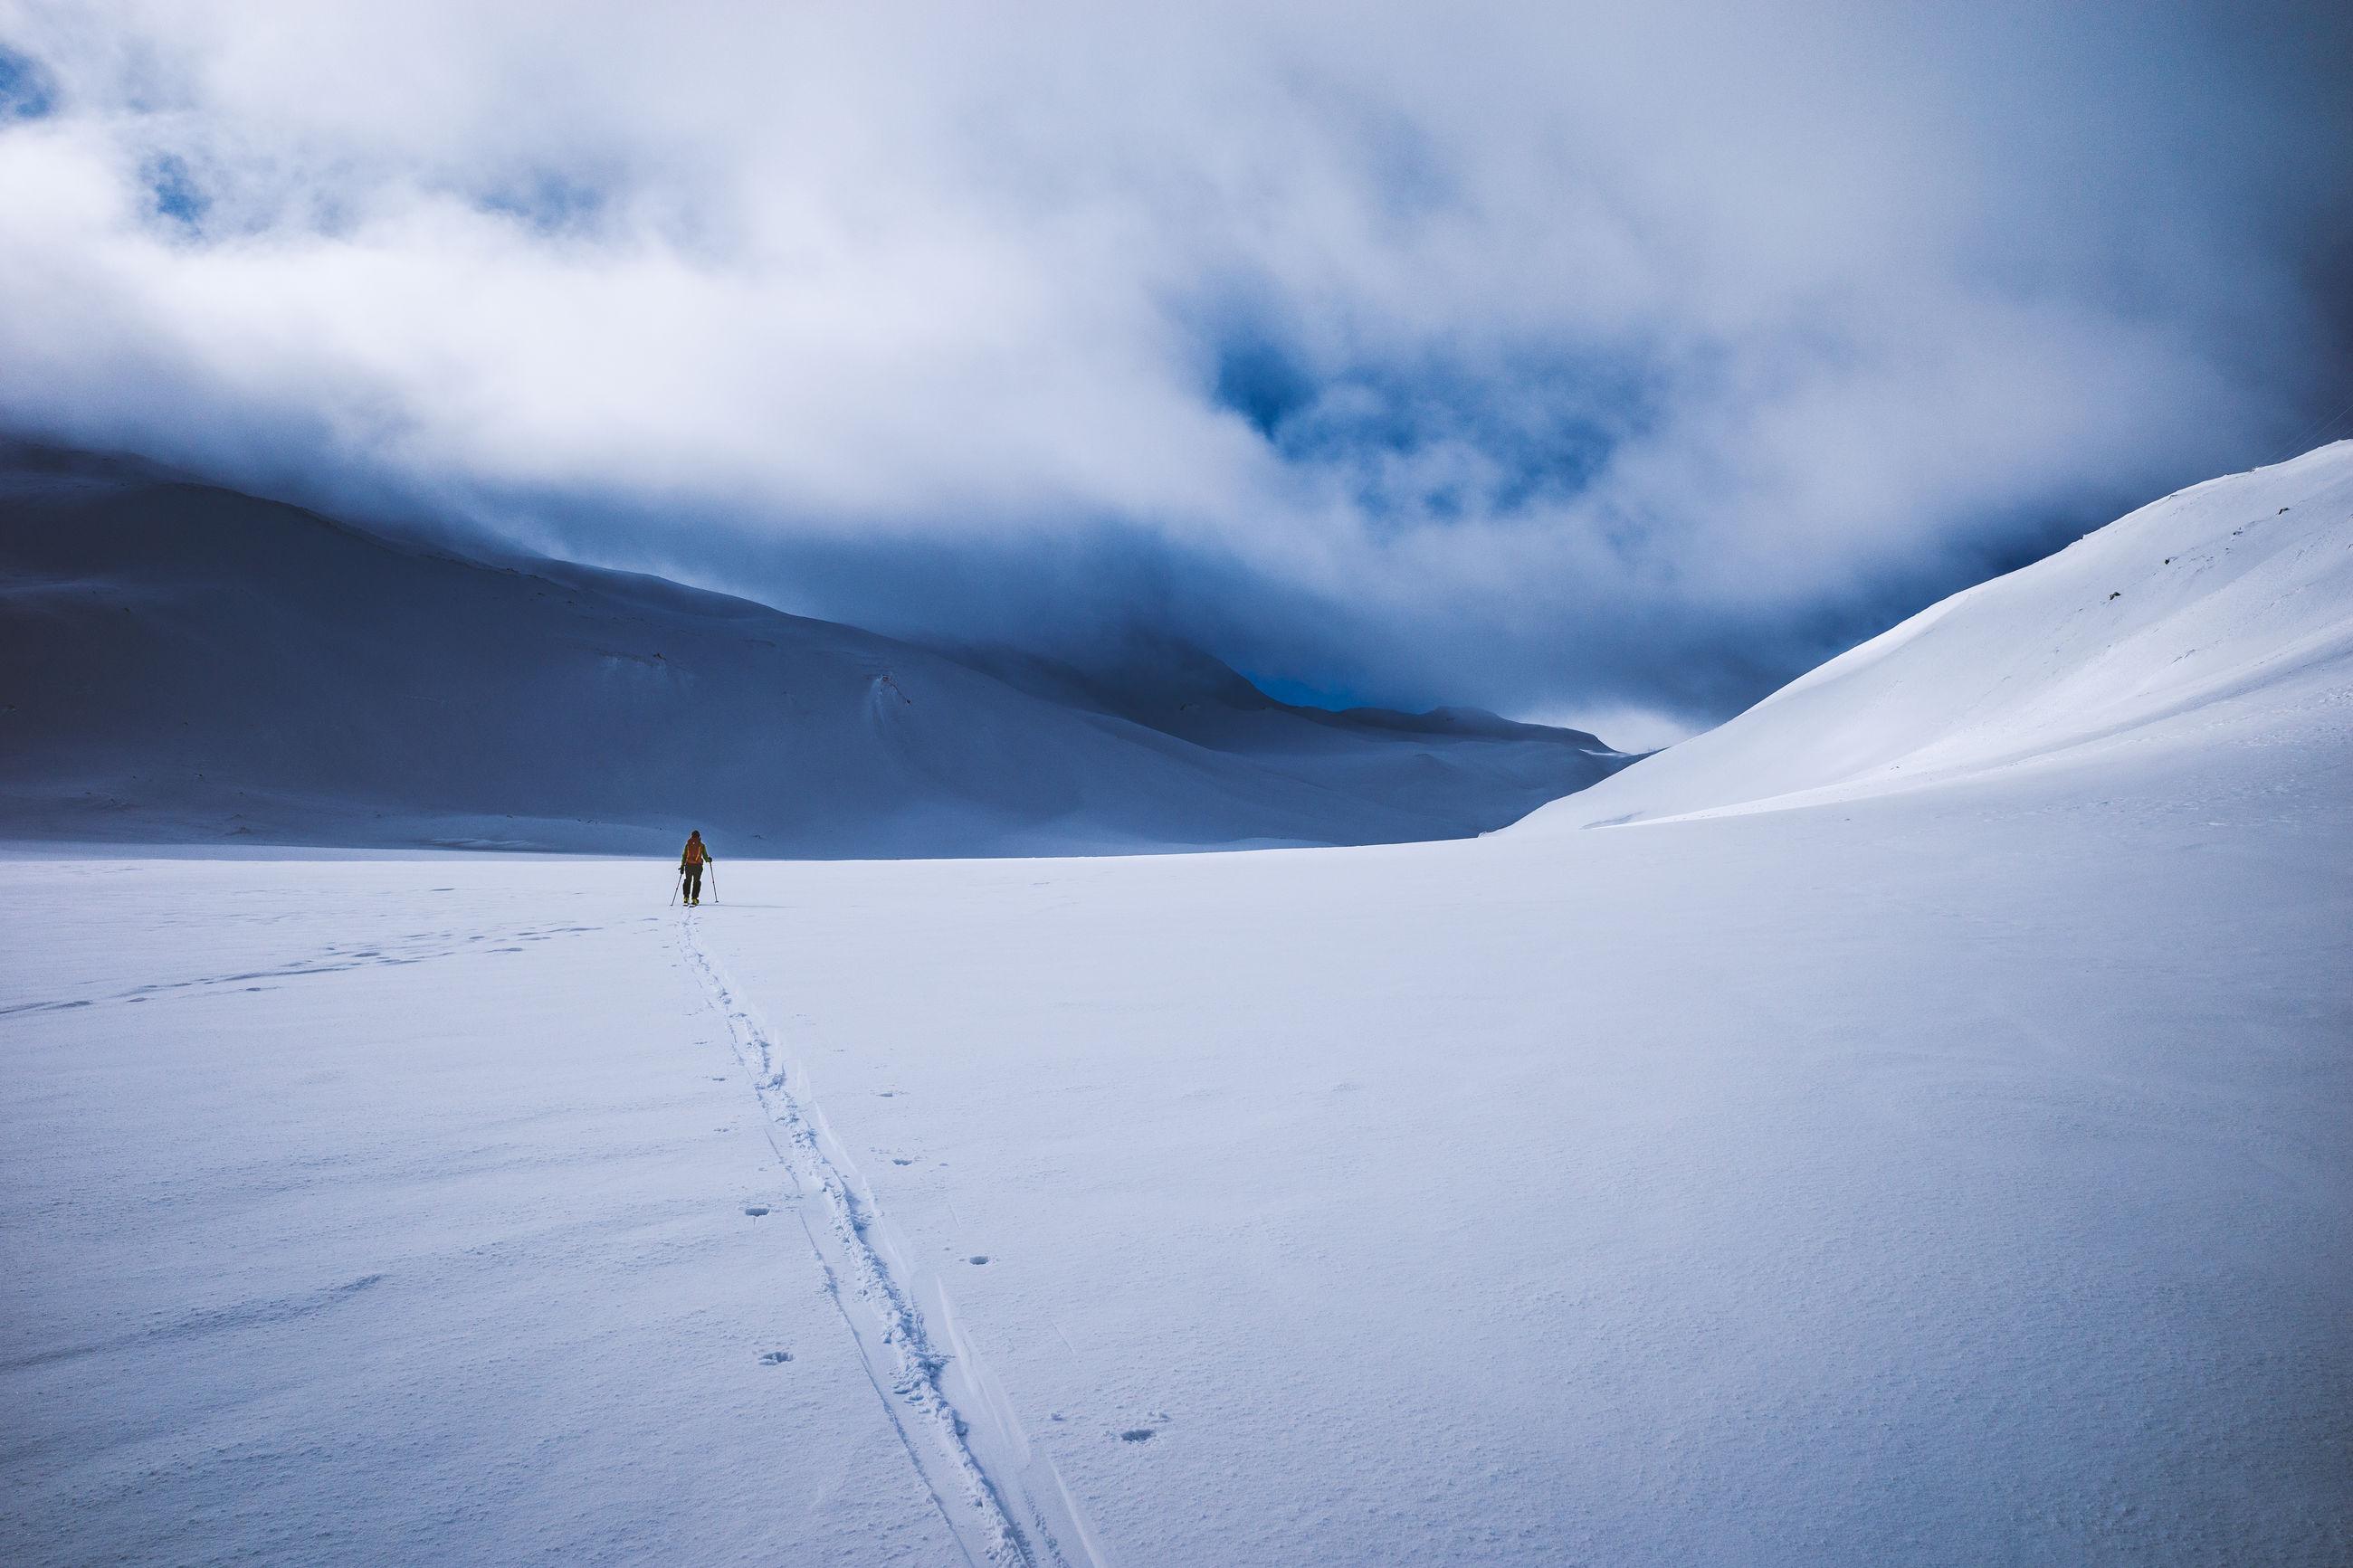 Skitour swiss alps